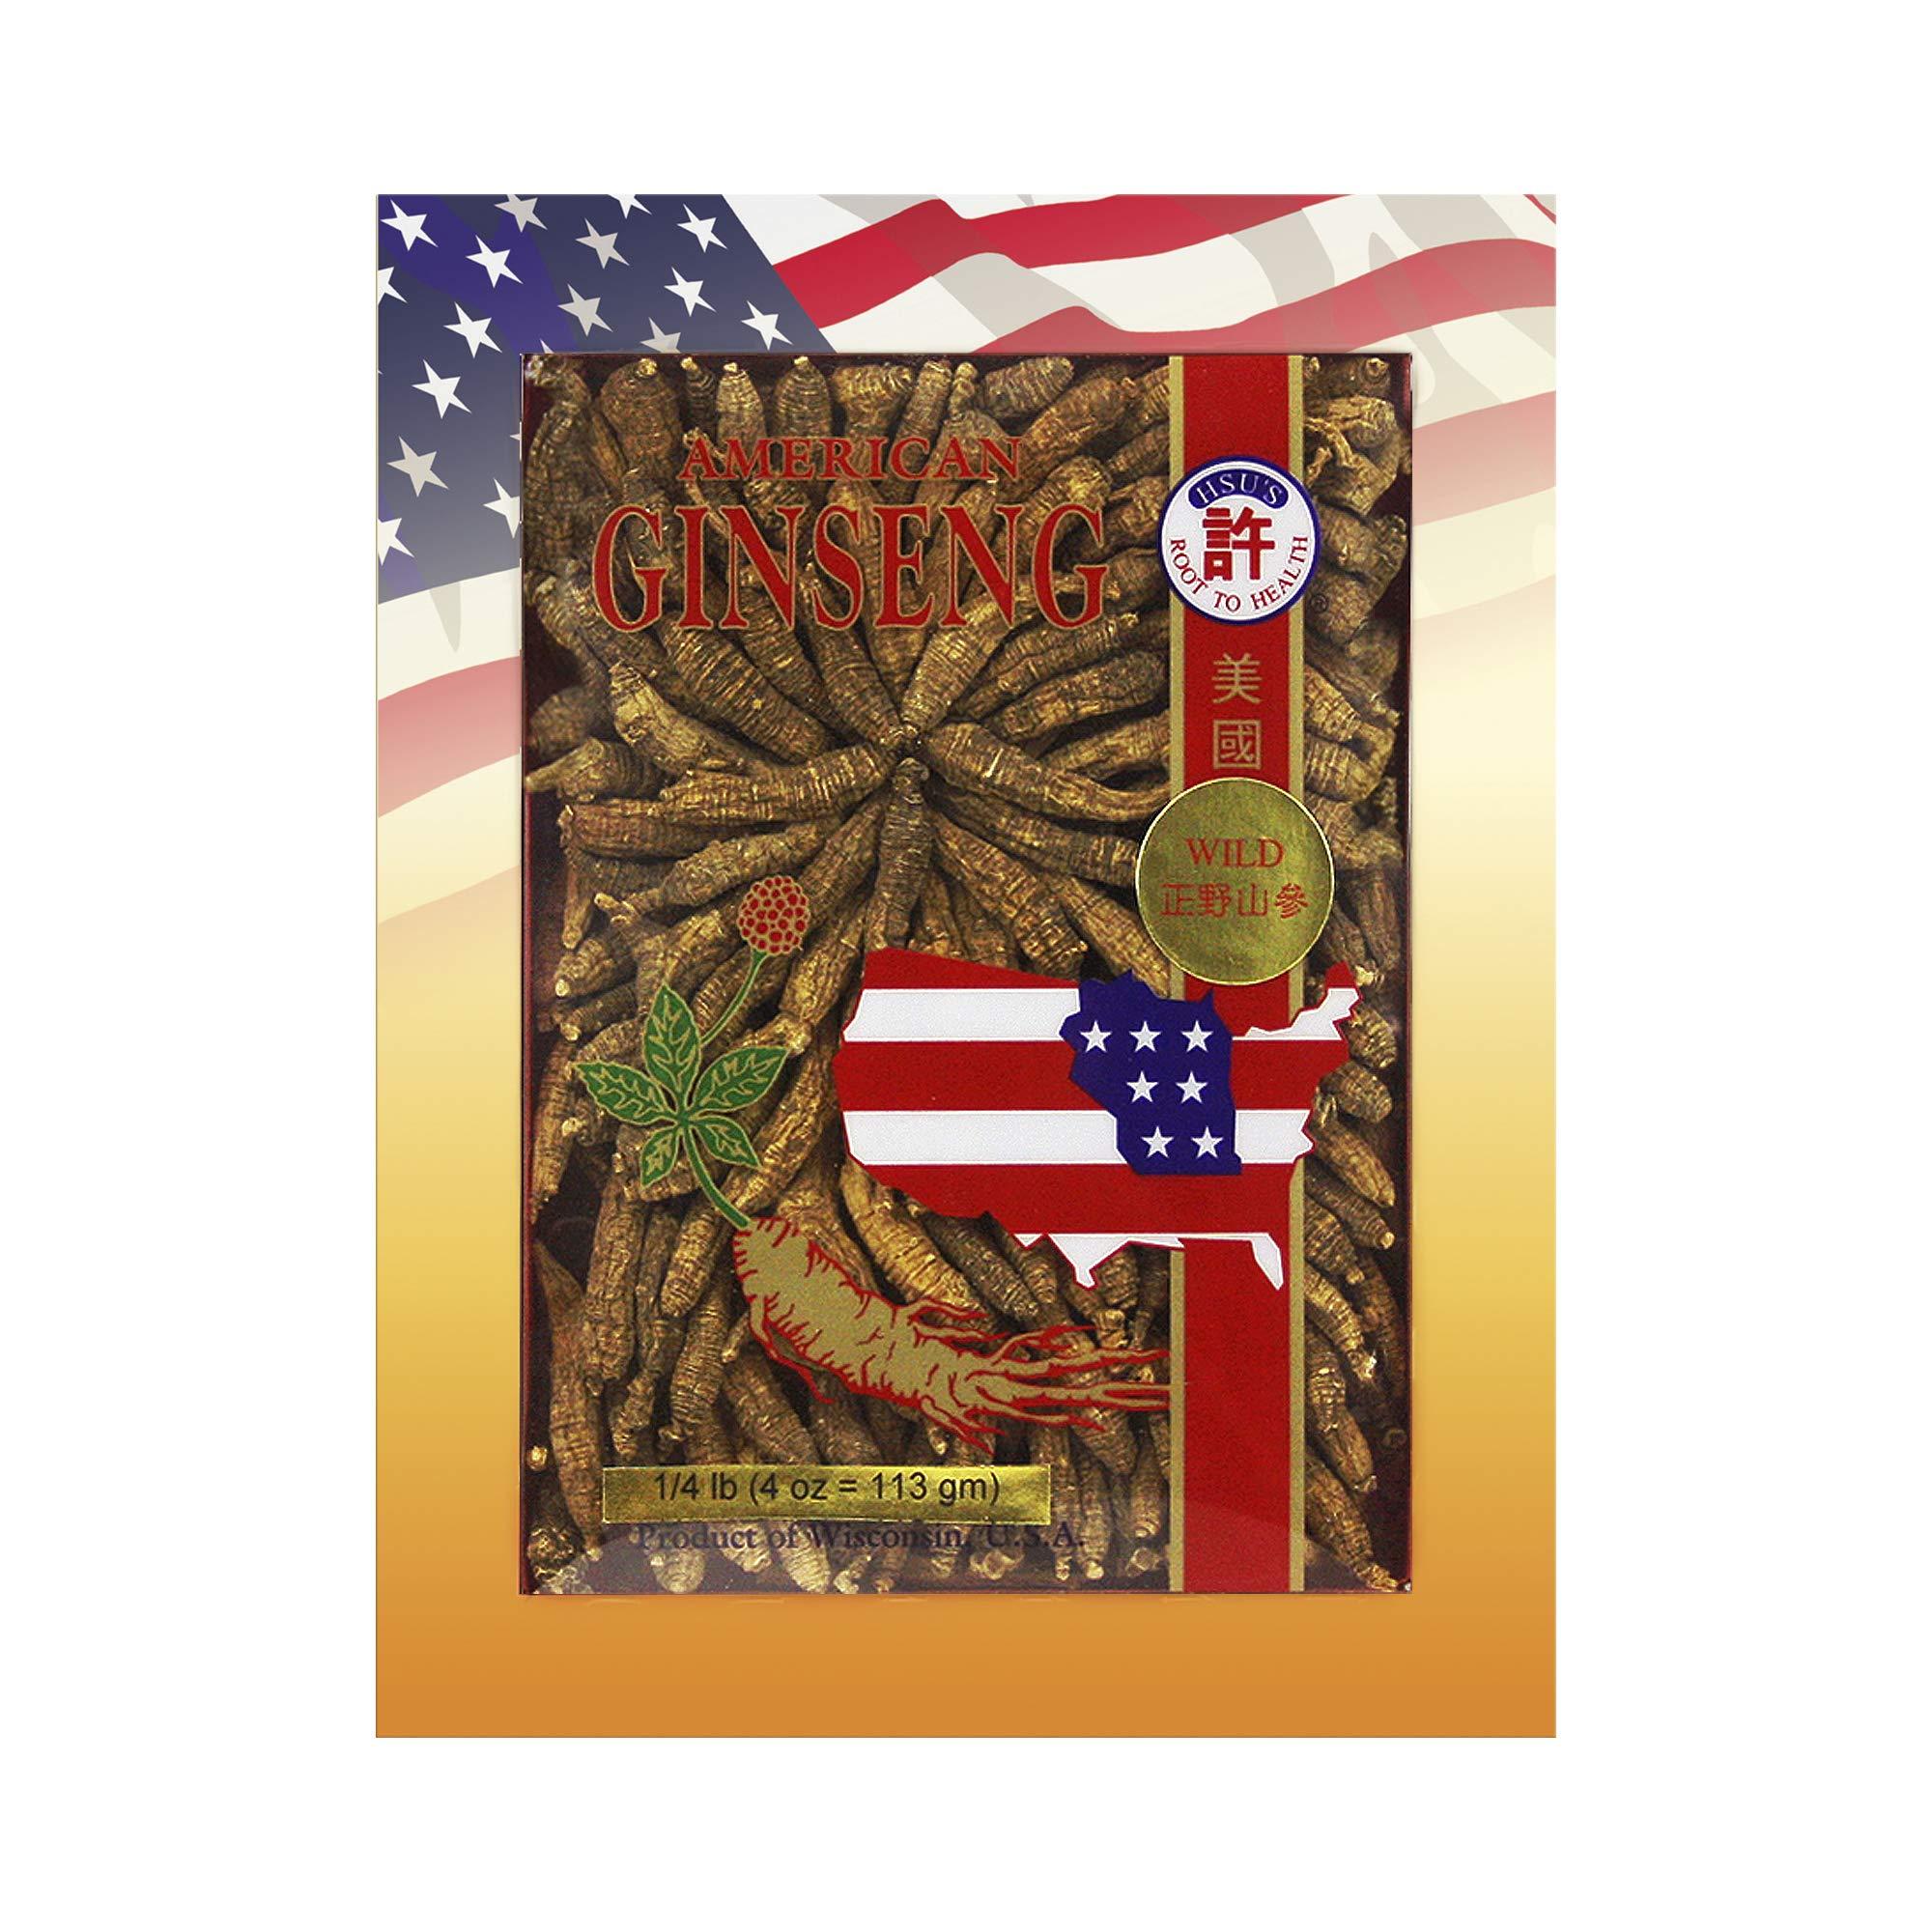 Hsu's Ginseng SKU 0334-4 | Wild Half Short Small #1 | Wild American Ginseng | 许氏花旗参正野山參短支小一號 | 4 oz Box,西洋参, 野山參